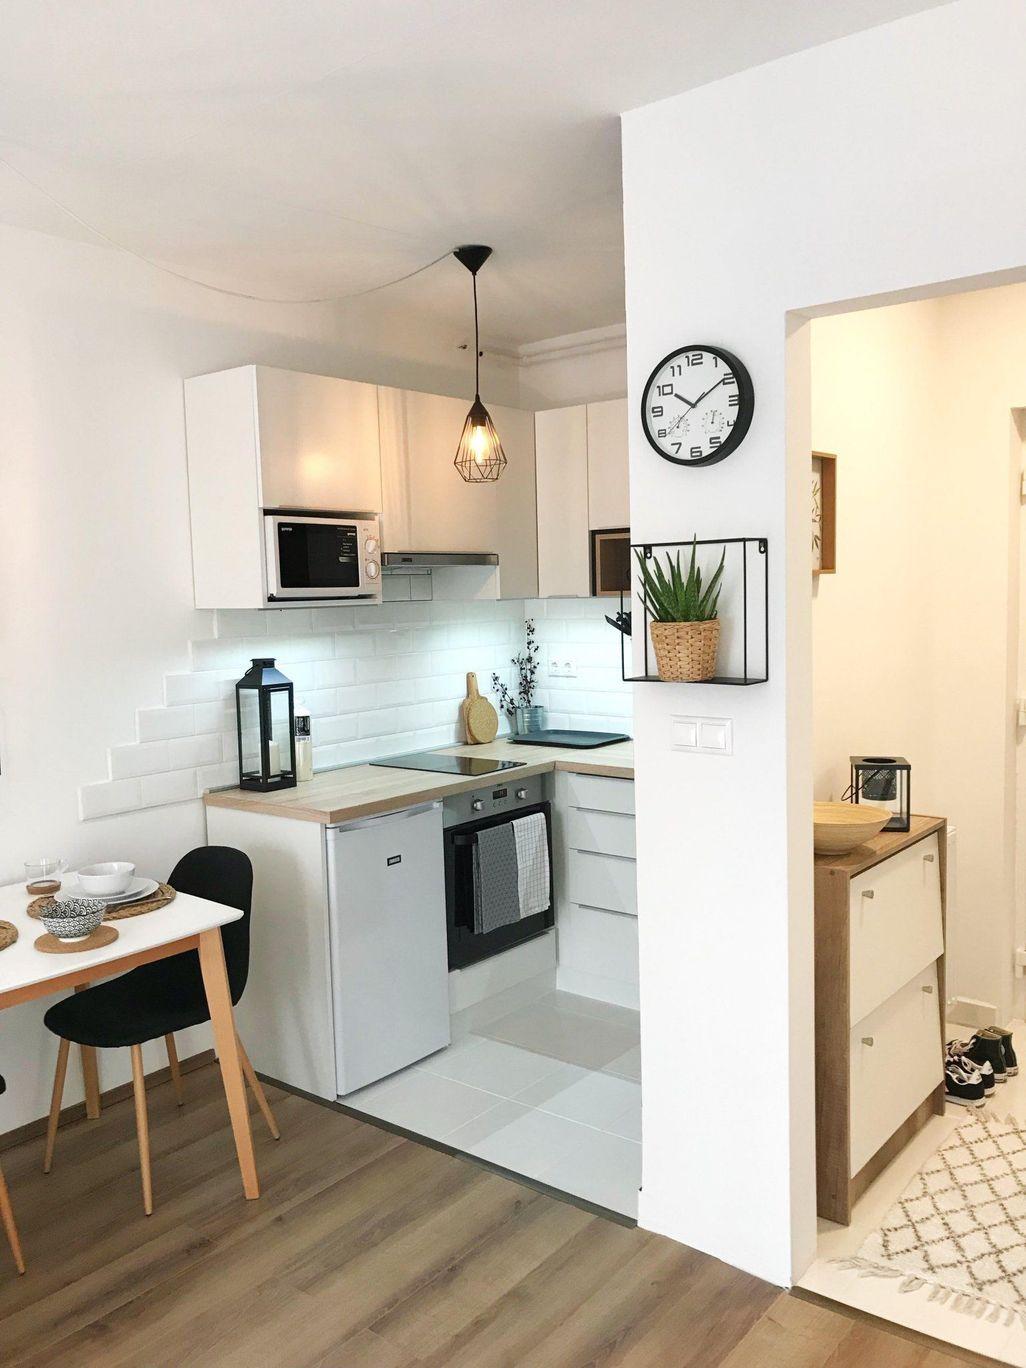 Small apartment kitchen interior design cozy apartments also home decoration hom decor deas pienien huoneiden koristelu rh br pinterest